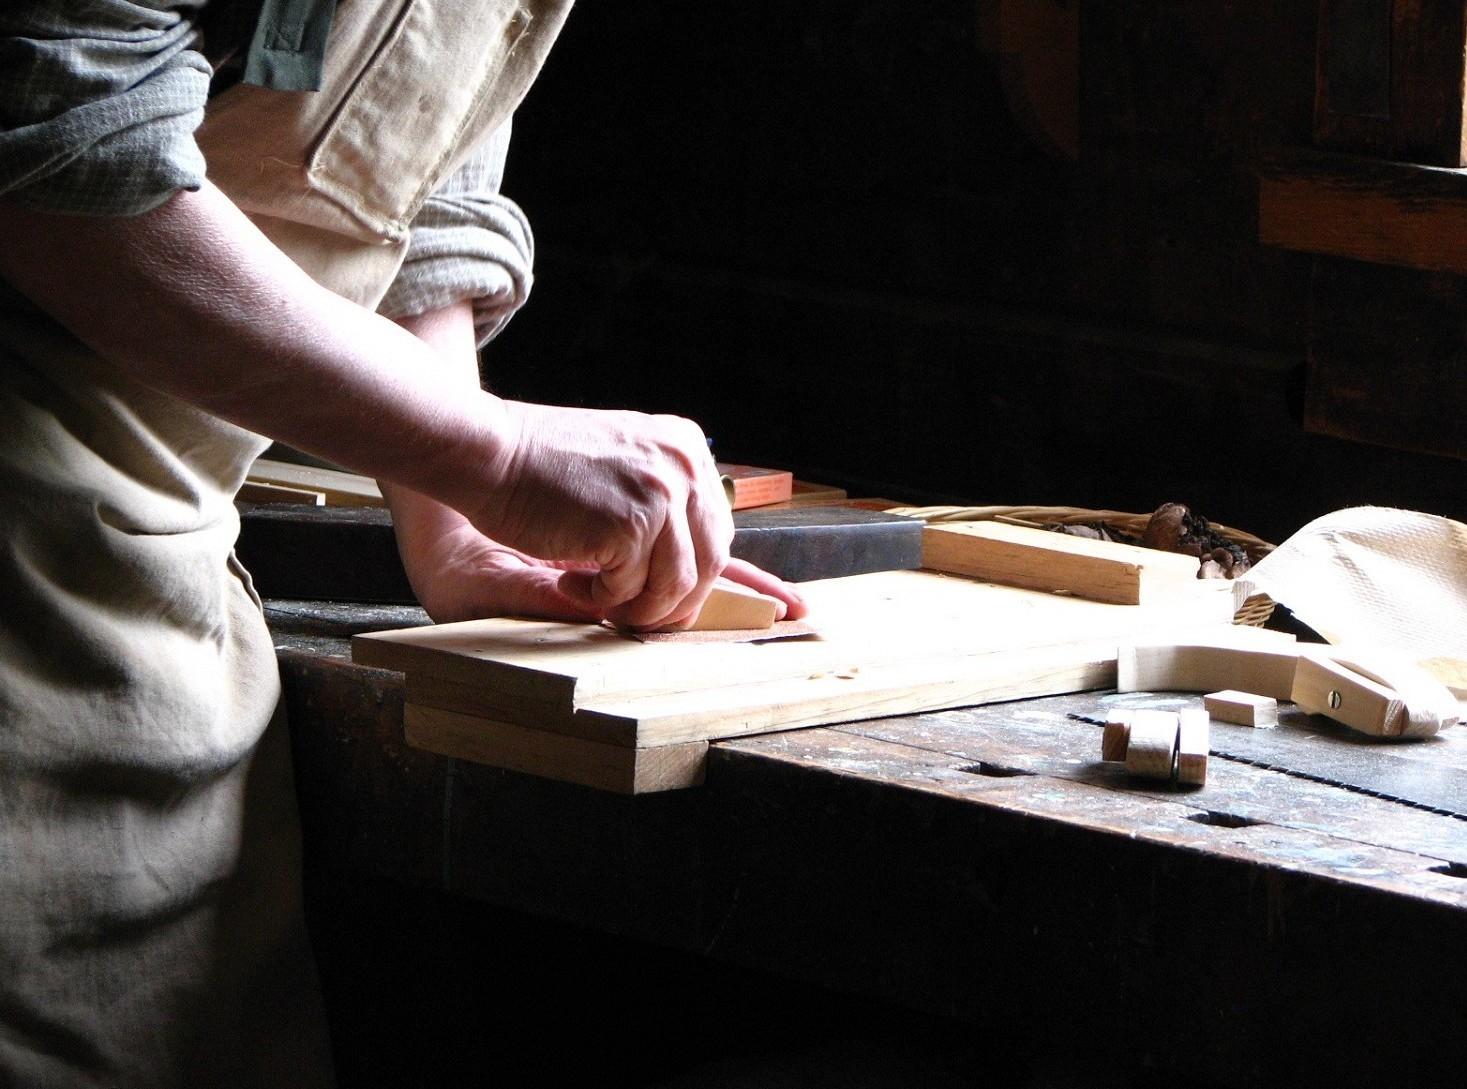 Ccnl Metalmeccanici e Ccnl metalmeccanici artigiani differenze nei contratti